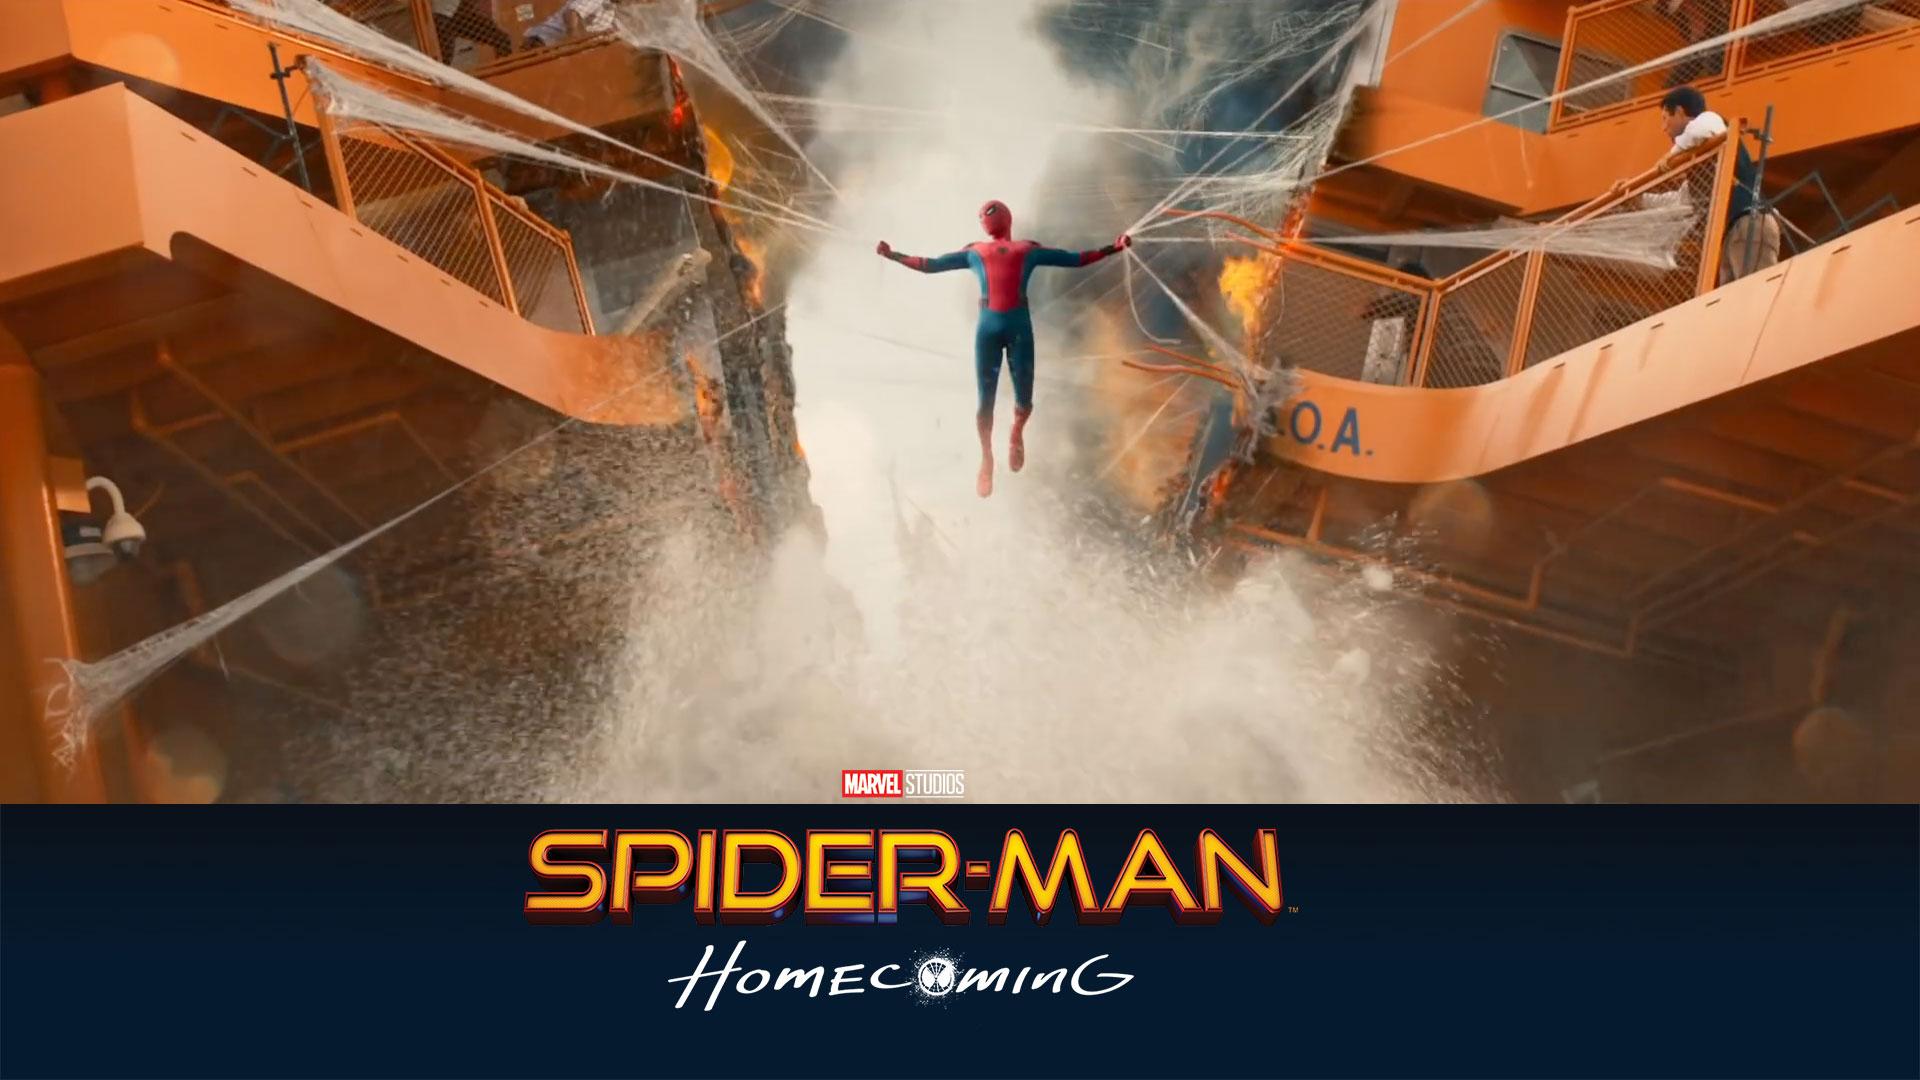 Marvel'-s Spider-Man PS4 E3 2017 HD desktop wallpaper : Widescreen ...